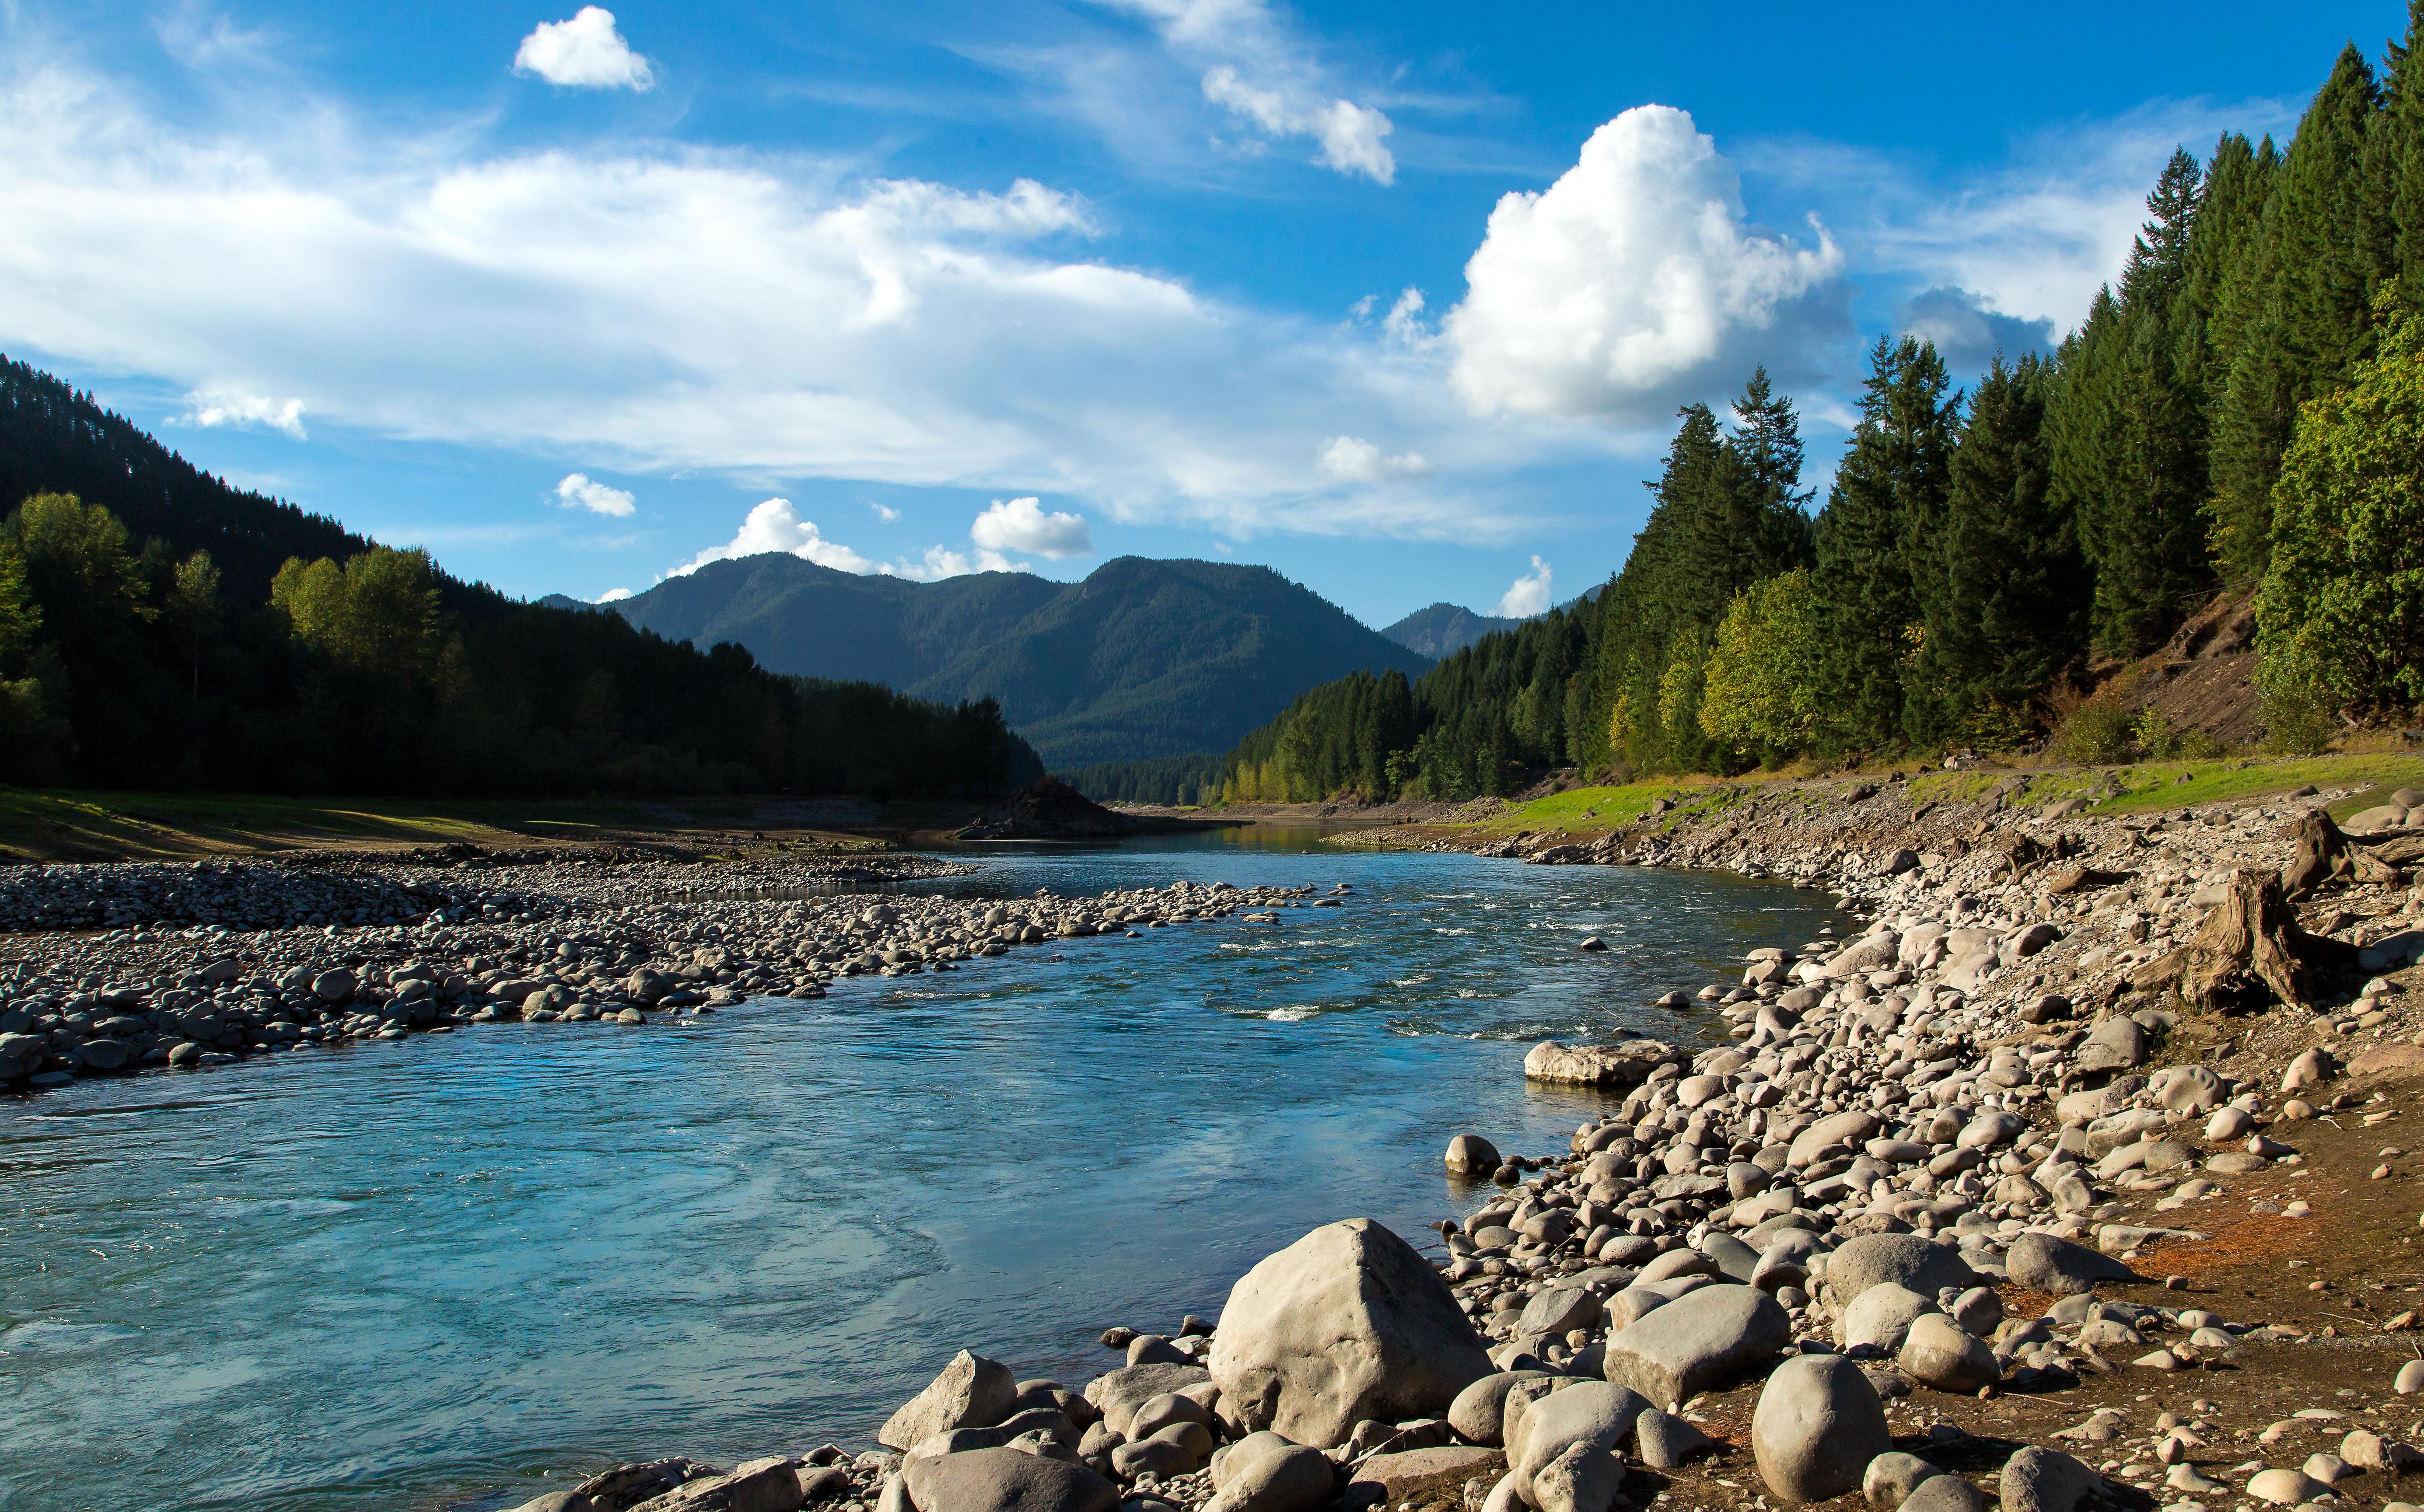 Free Images : Landscape, Sea, Nature, Wilderness, Walking